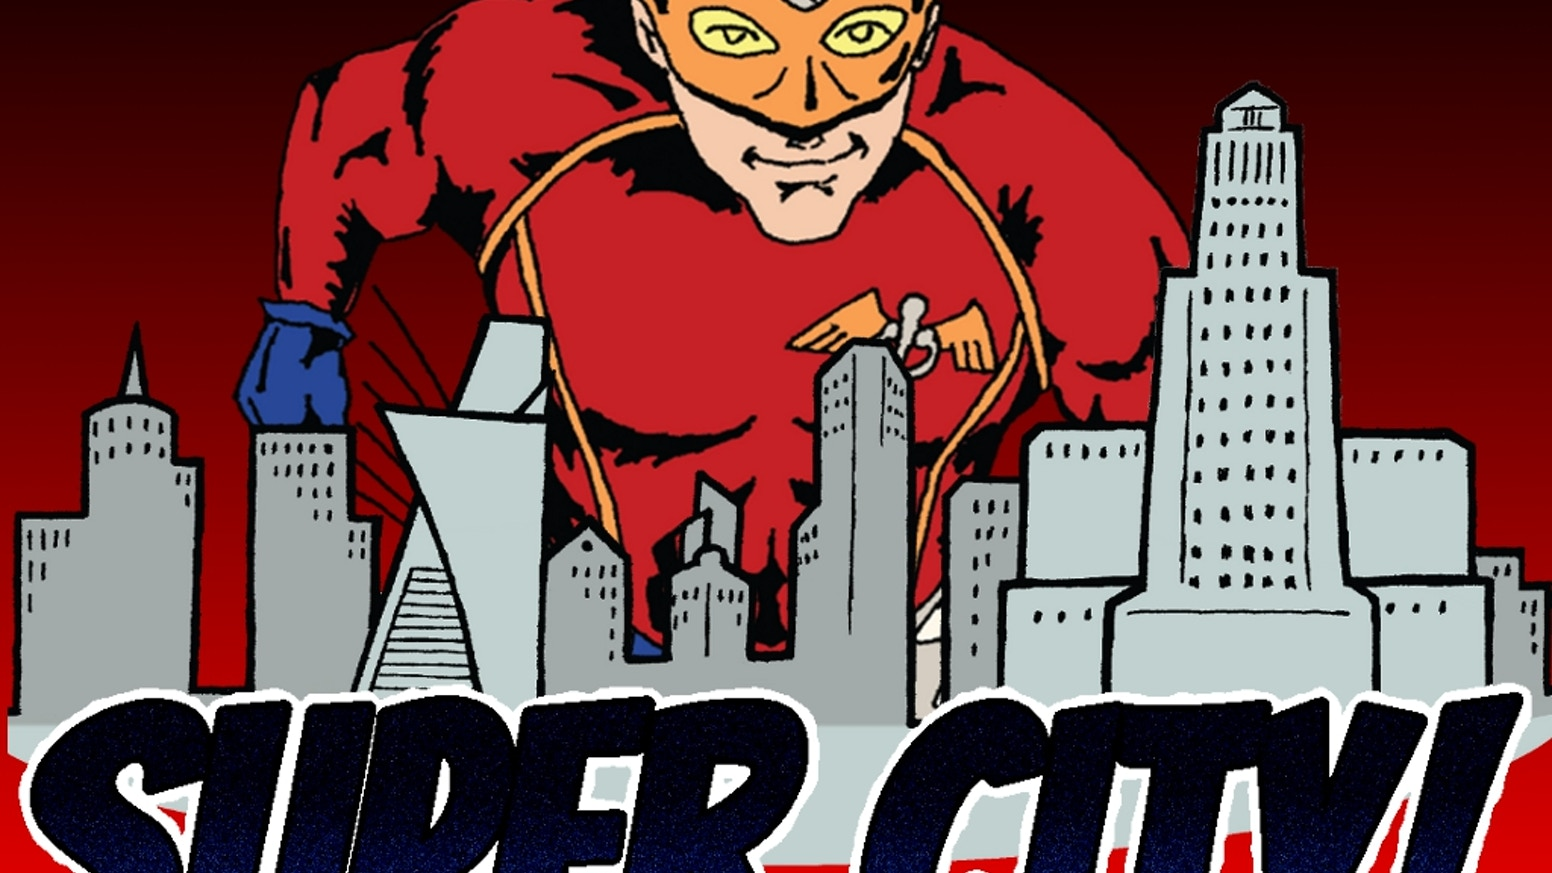 Super City The Game Of Supers Villains And Secret Agendas